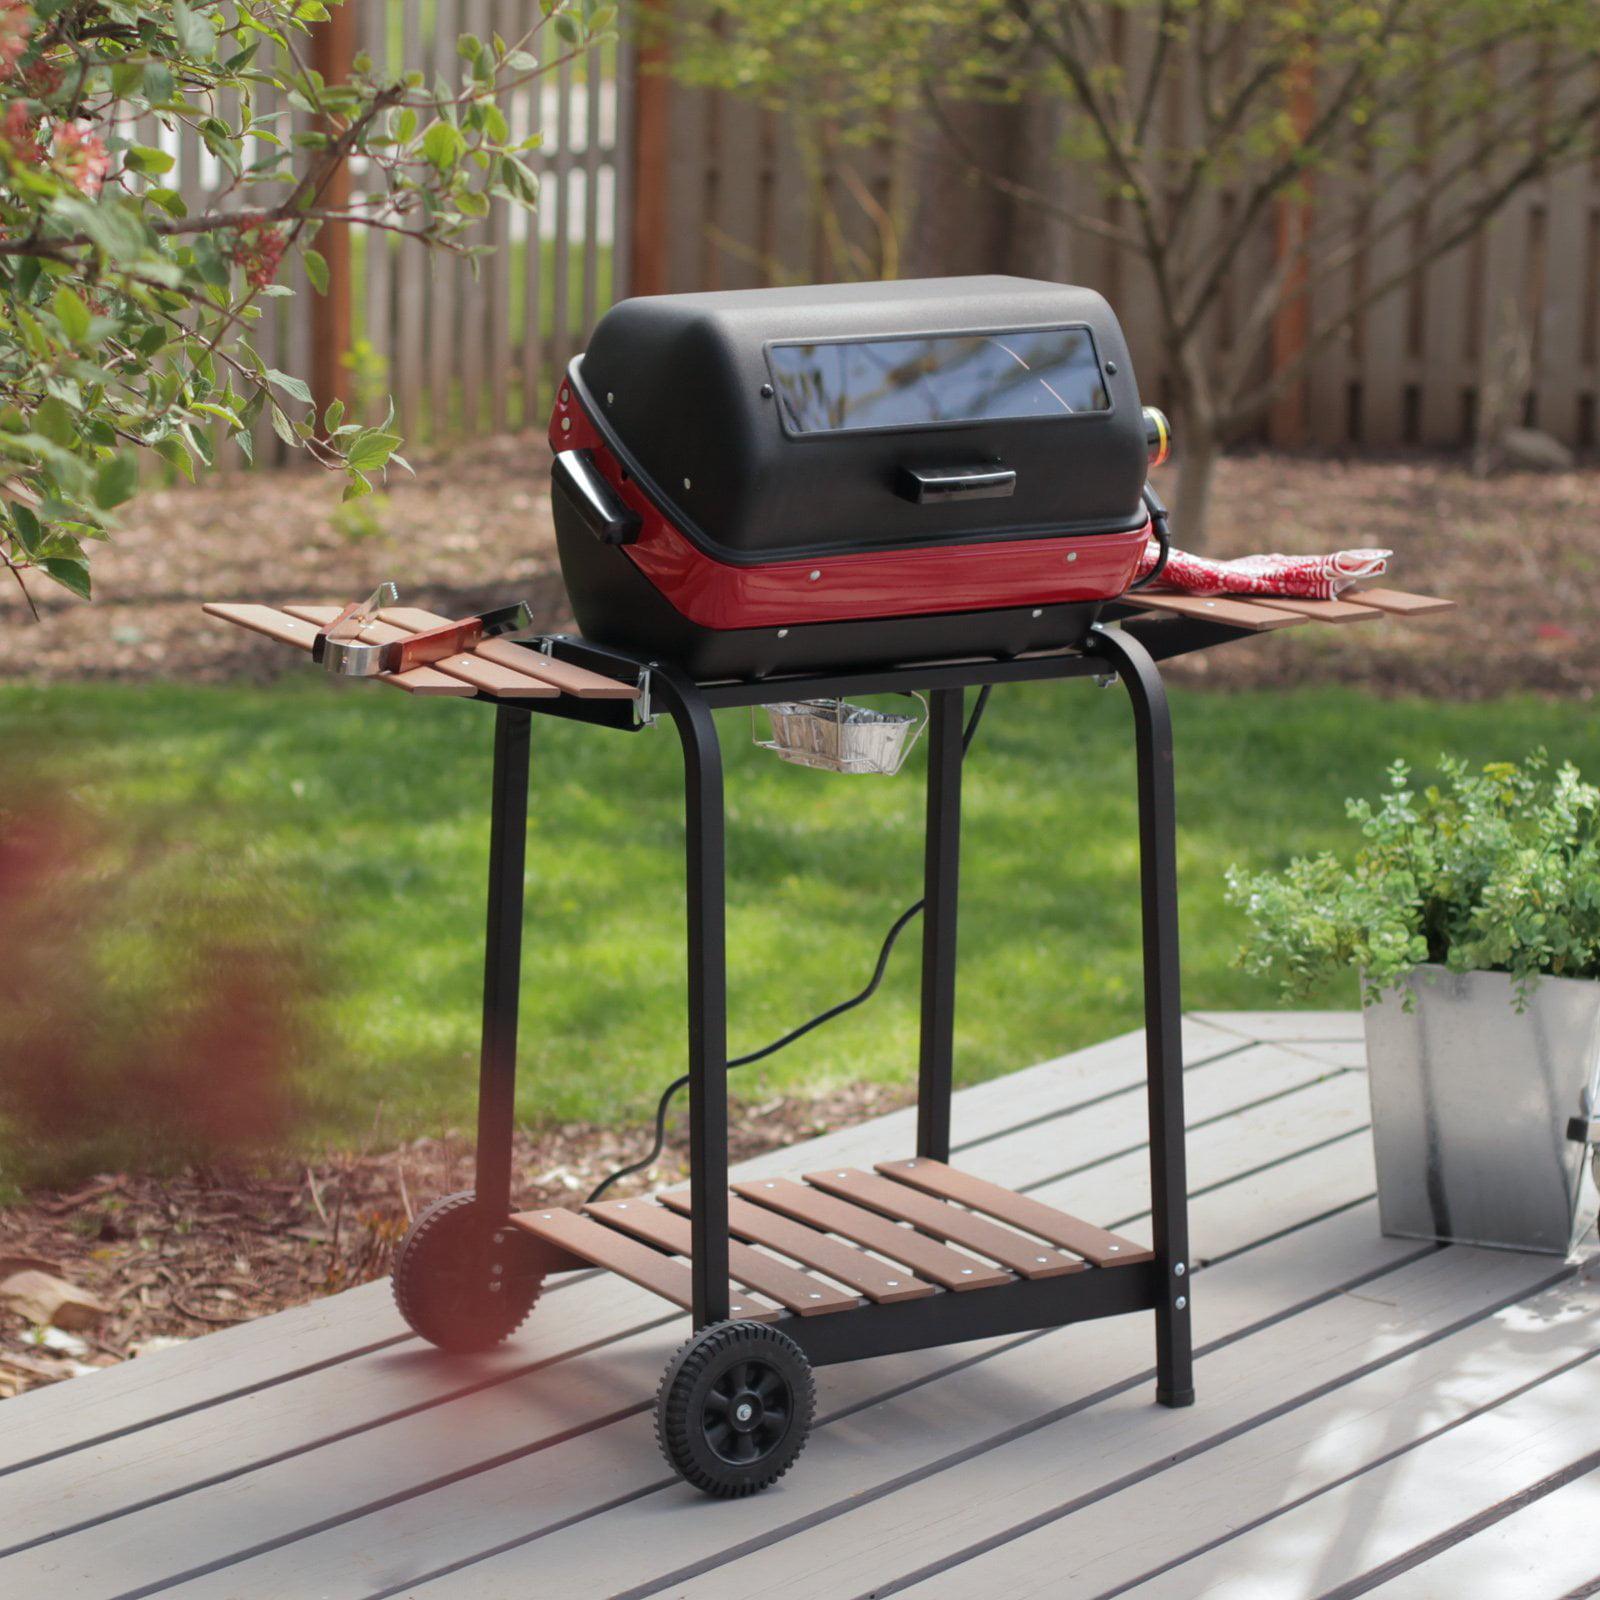 Americana 1500-Watt Deluxe Electric Grill w/ Rotisserie Included